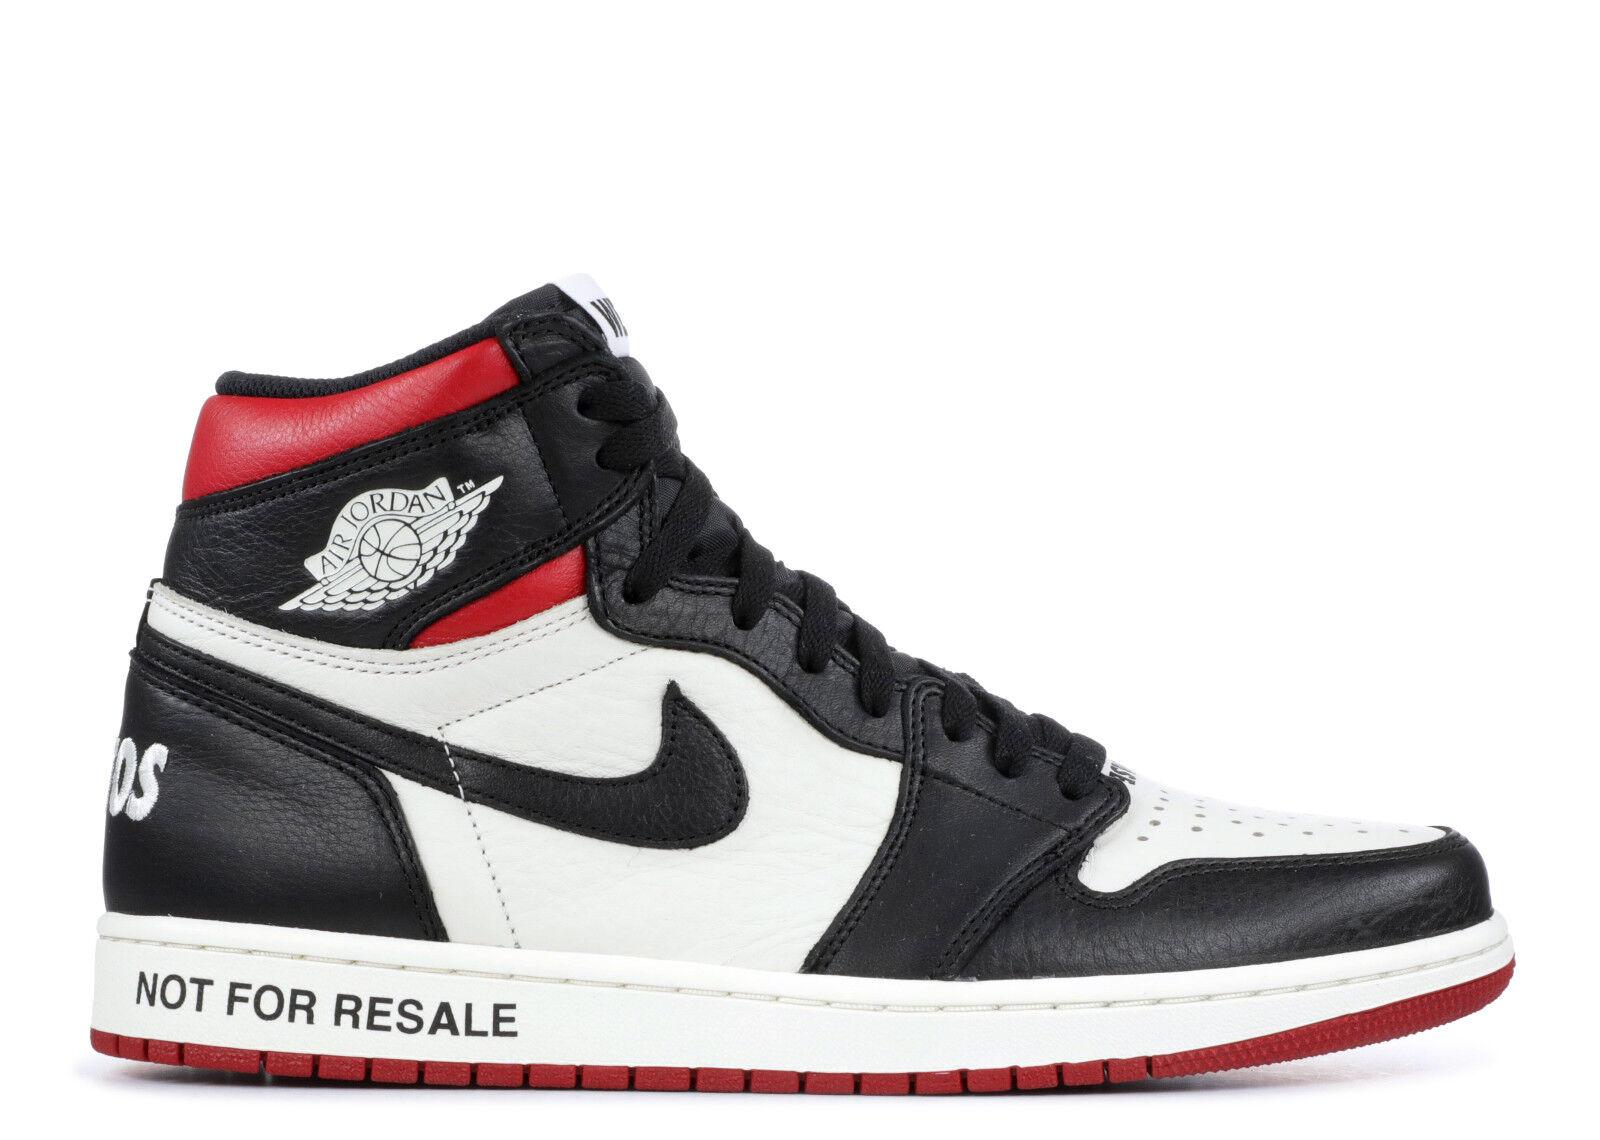 best sneakers 86bdb f93dd Nike Air Jordan 1 Retro High OG Not For Resale Varsity Red Size 13. 861428